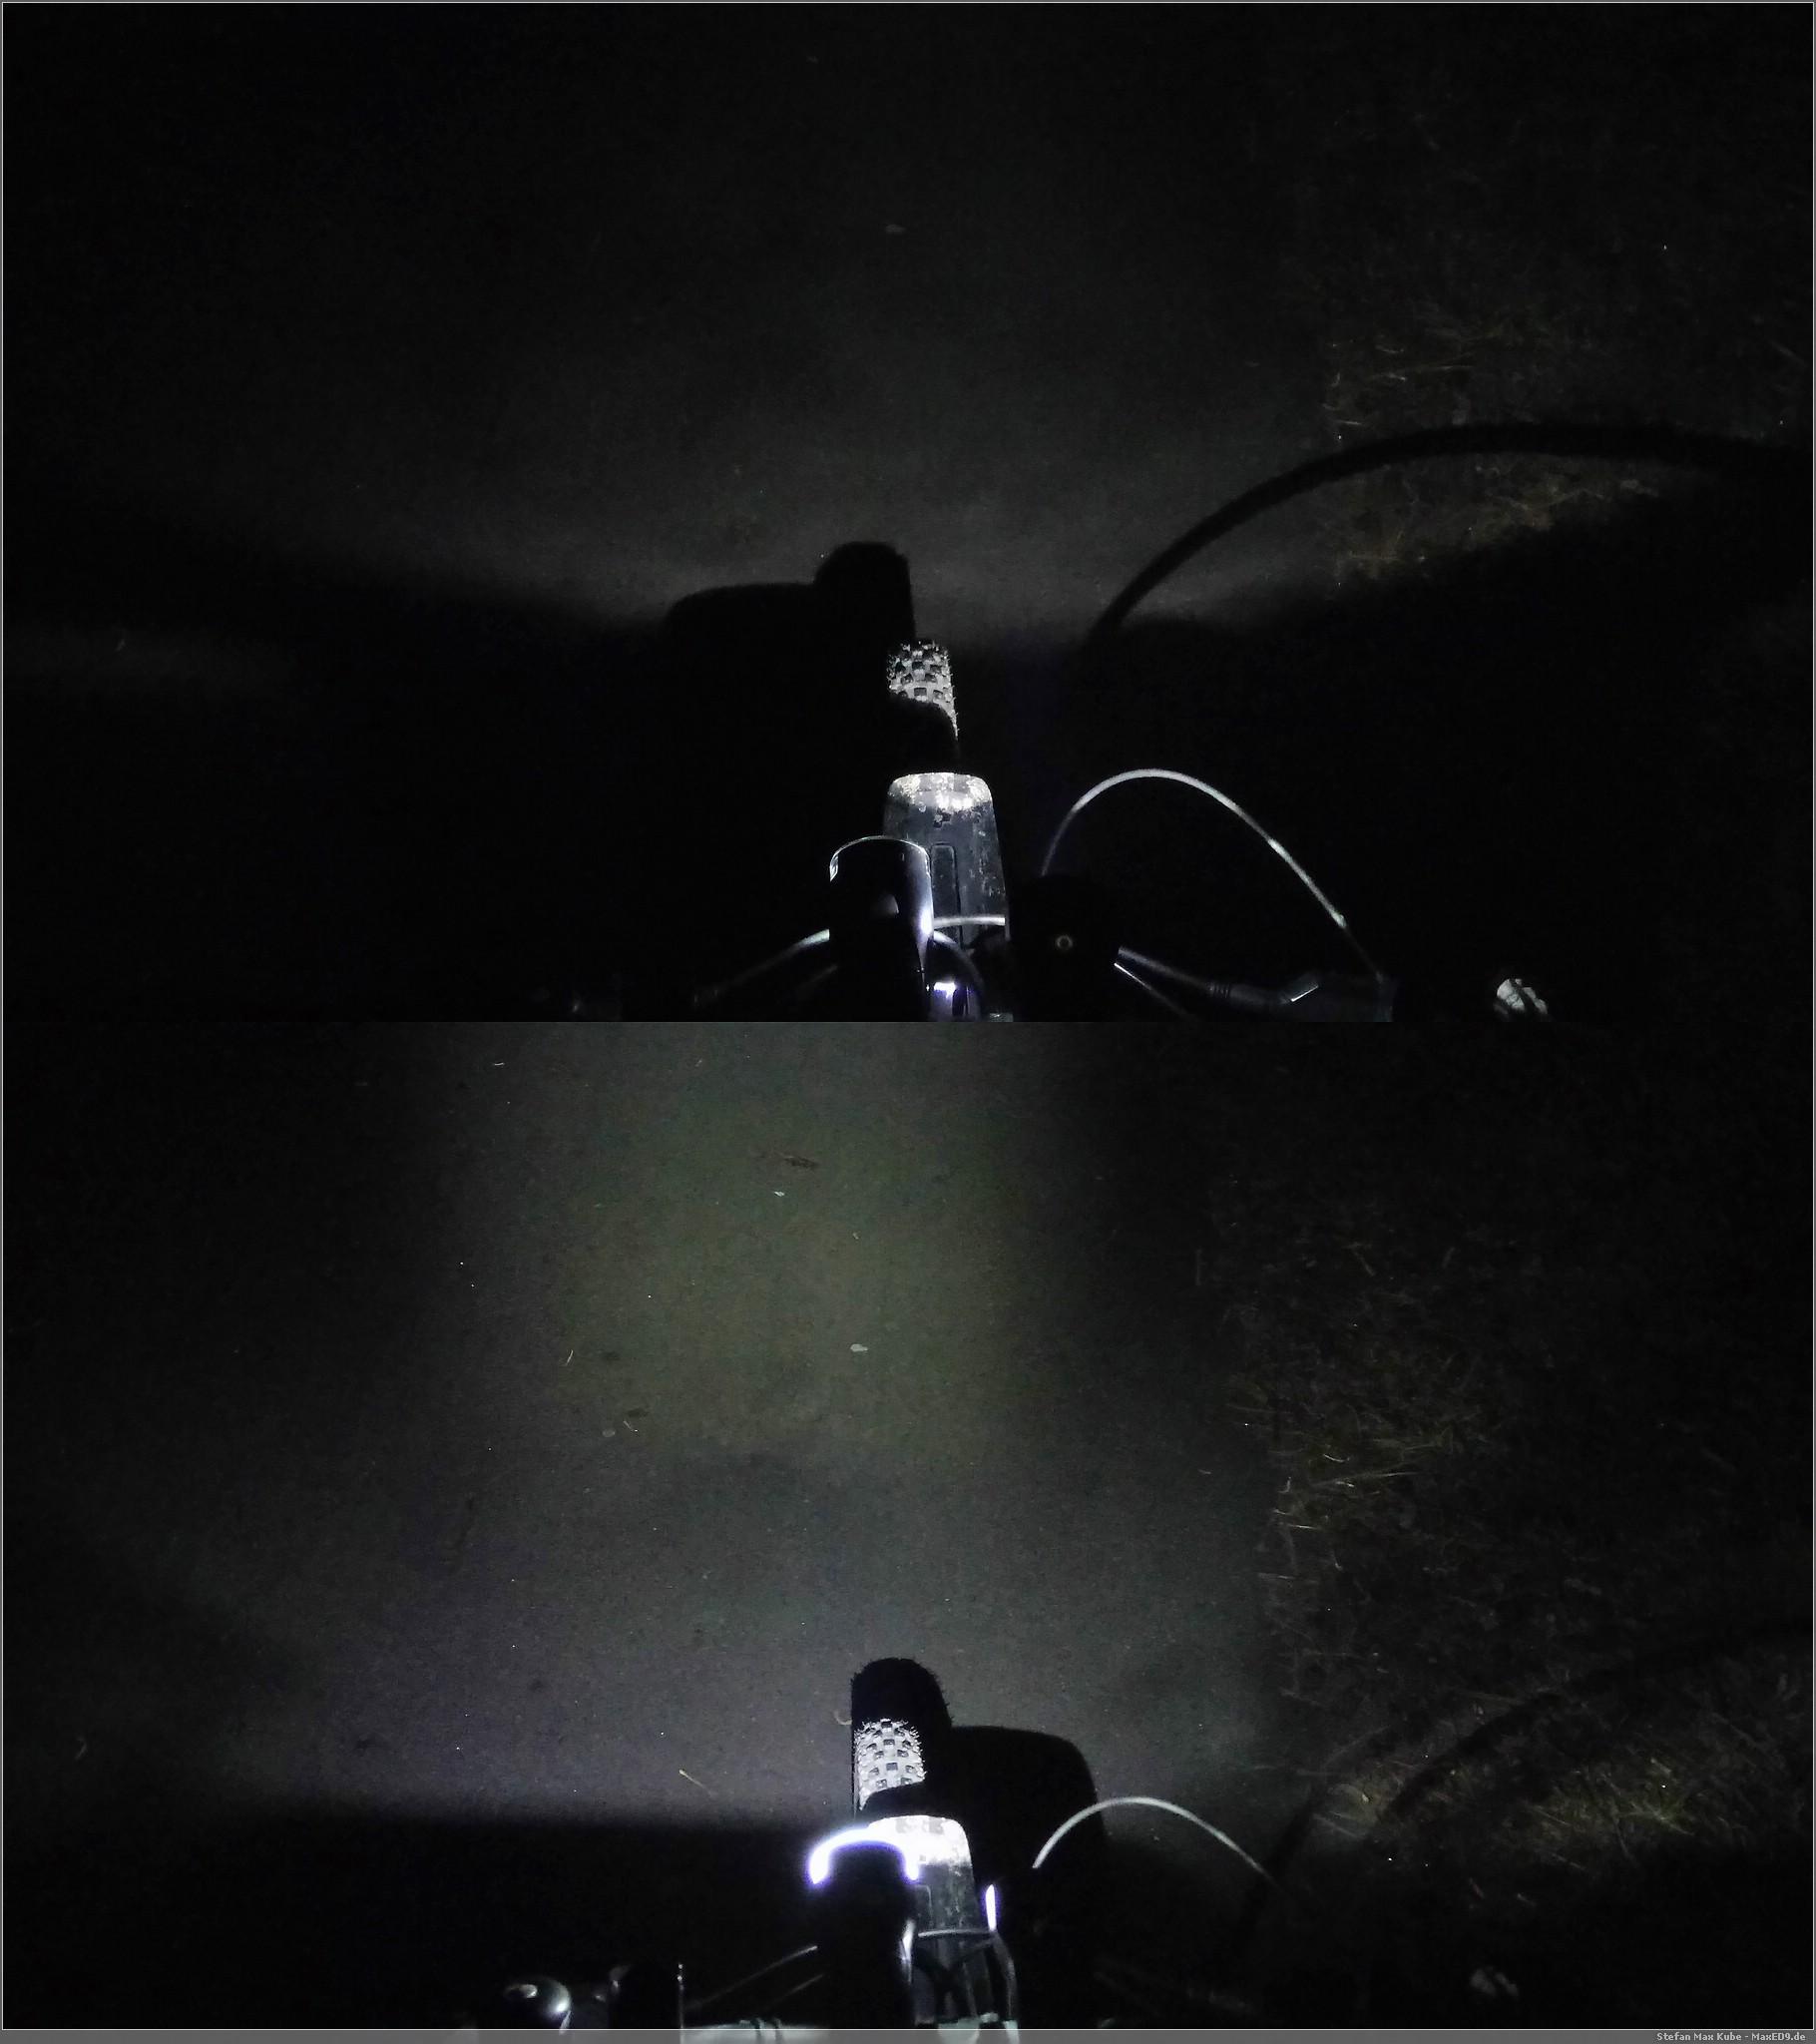 Vergleich: oben Büchel Oslo Sensor | unten Lunivo Vegas F40 RSL